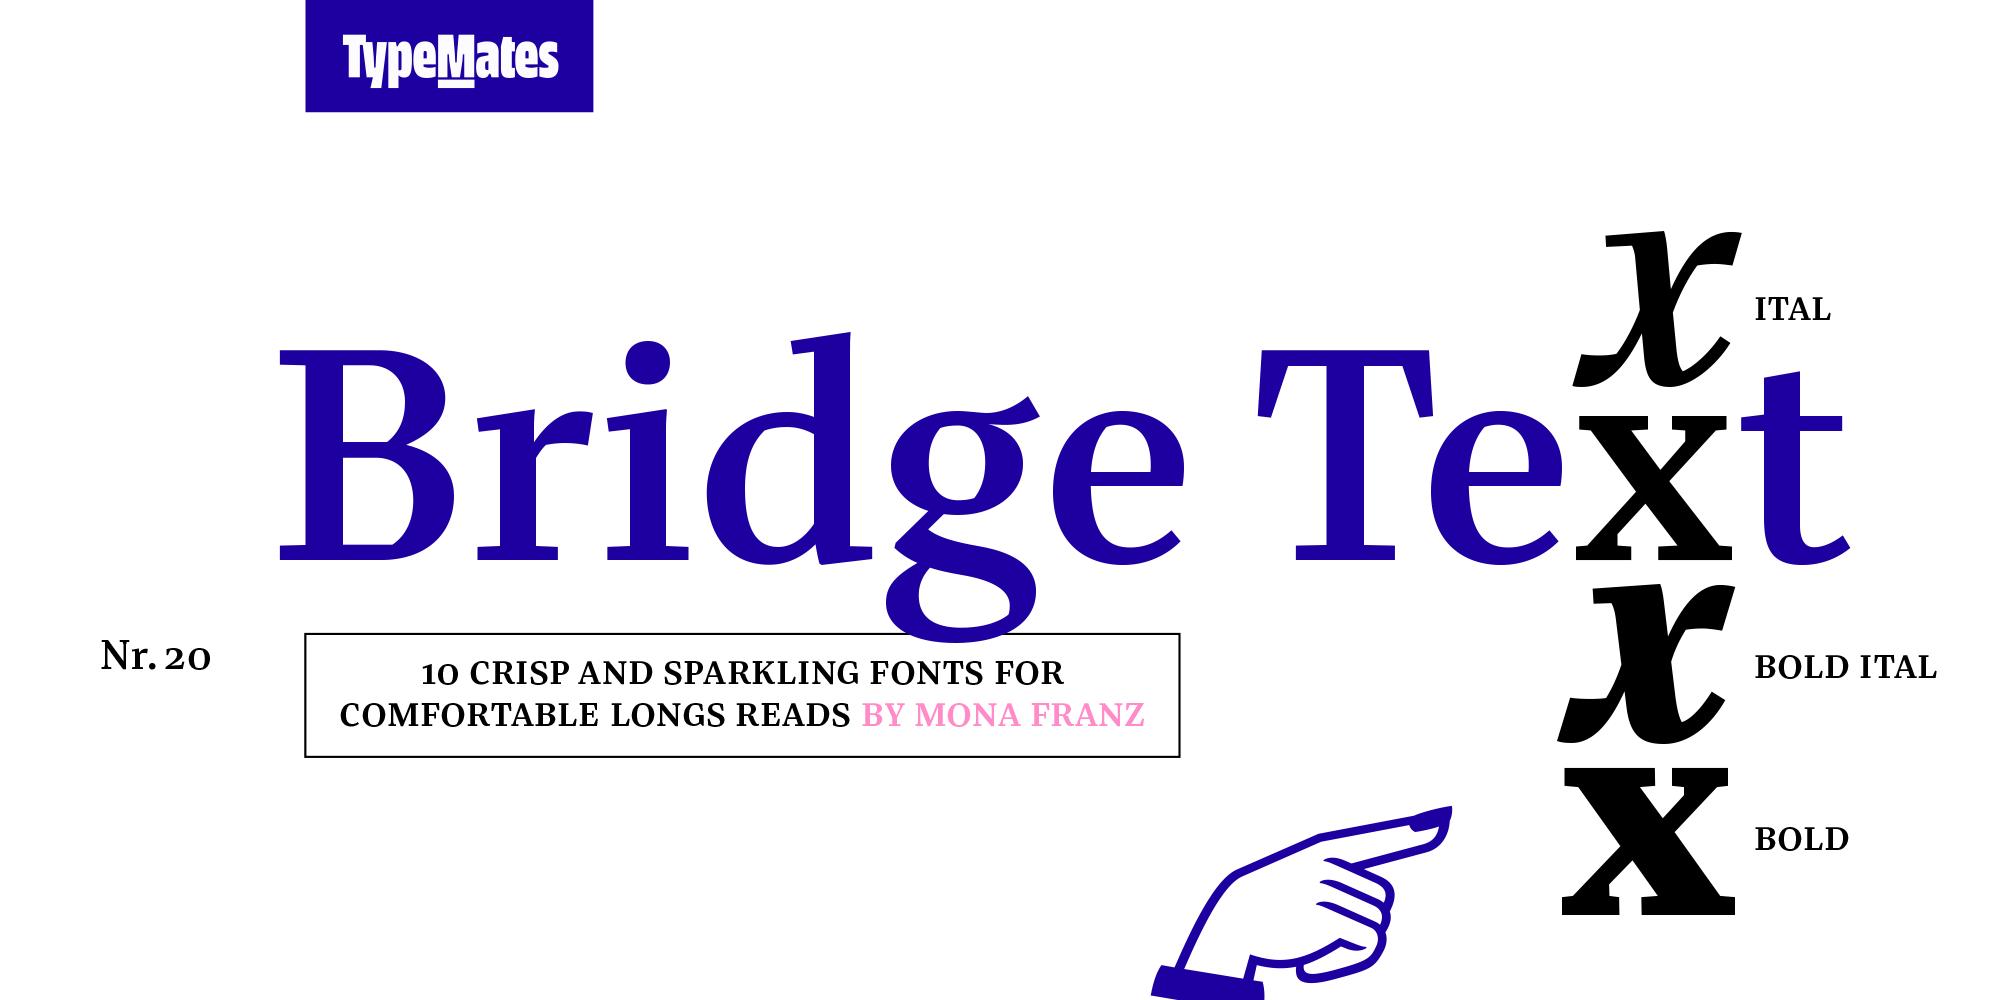 TypeMates-BridgeText-MonaFranz-00